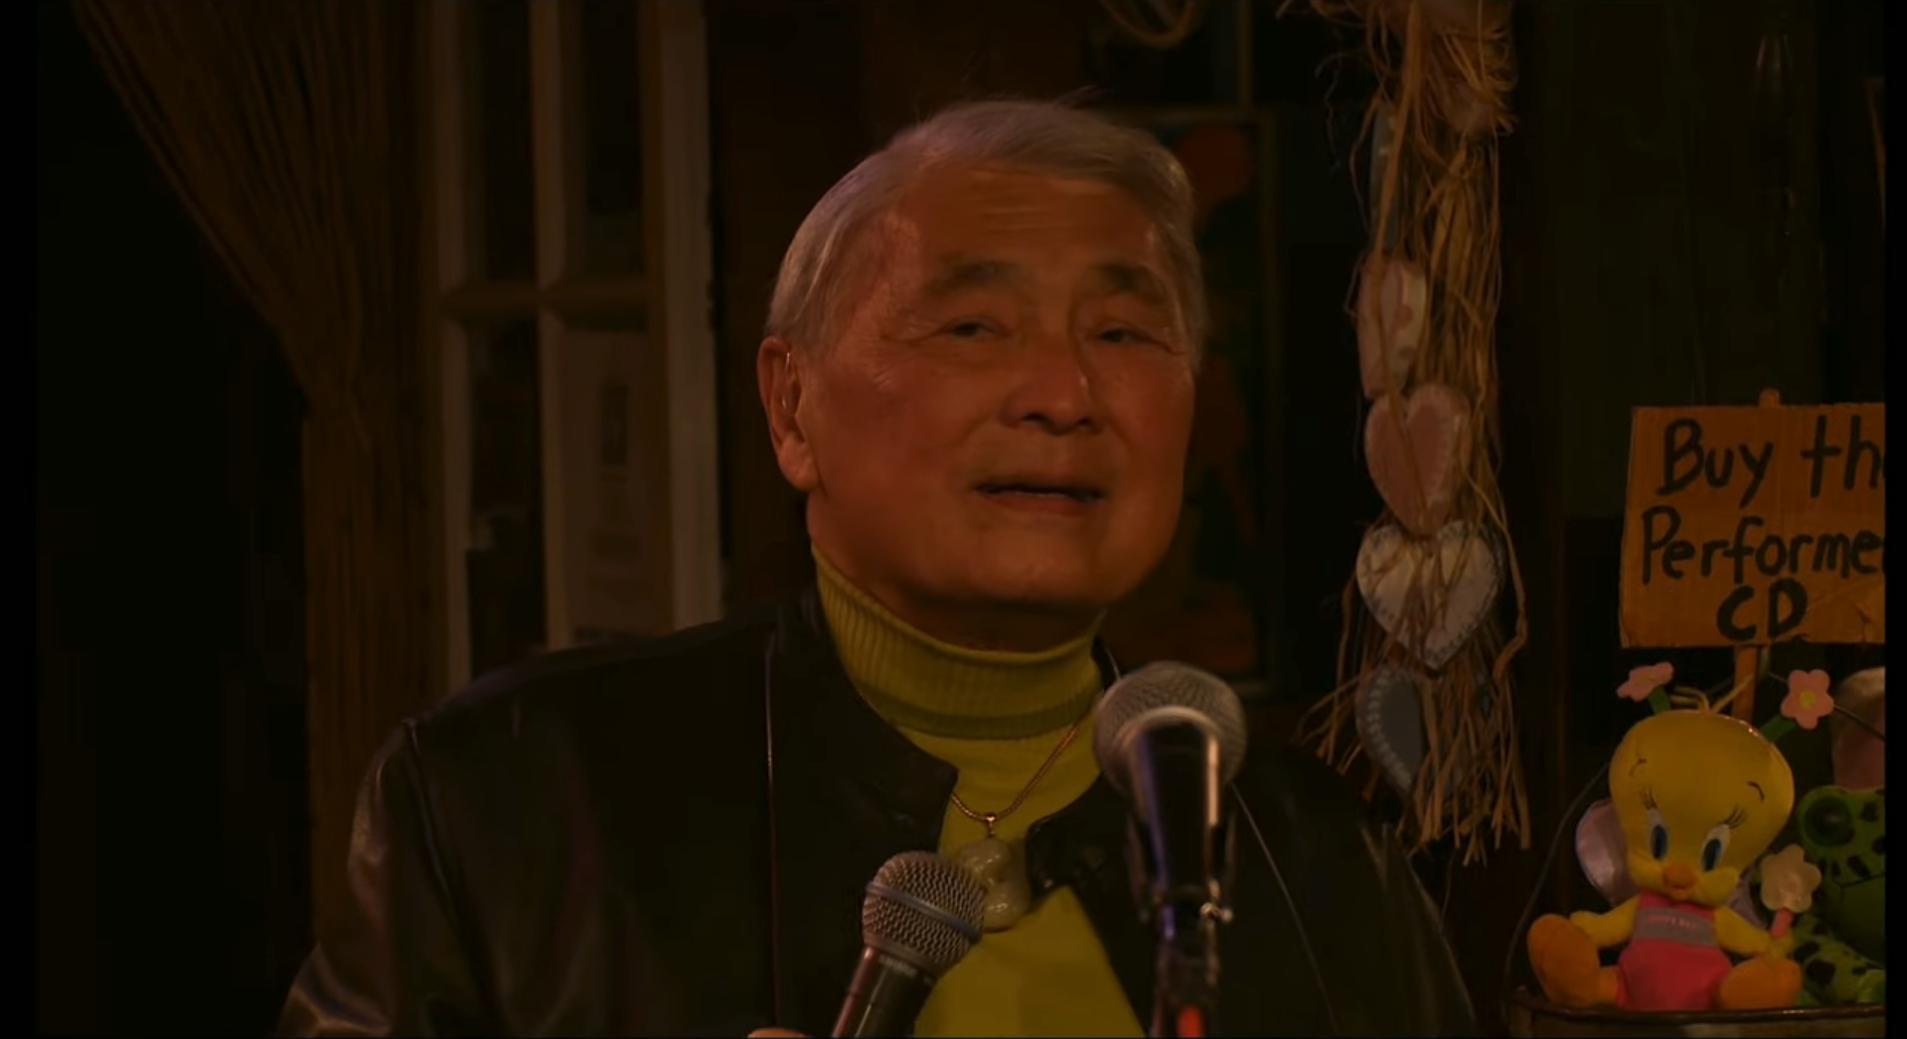 www.weareresonate.com: 'Flower Drum Song' Asian American Broadway pioneer Alvin Ing dies from COVID-19 complications